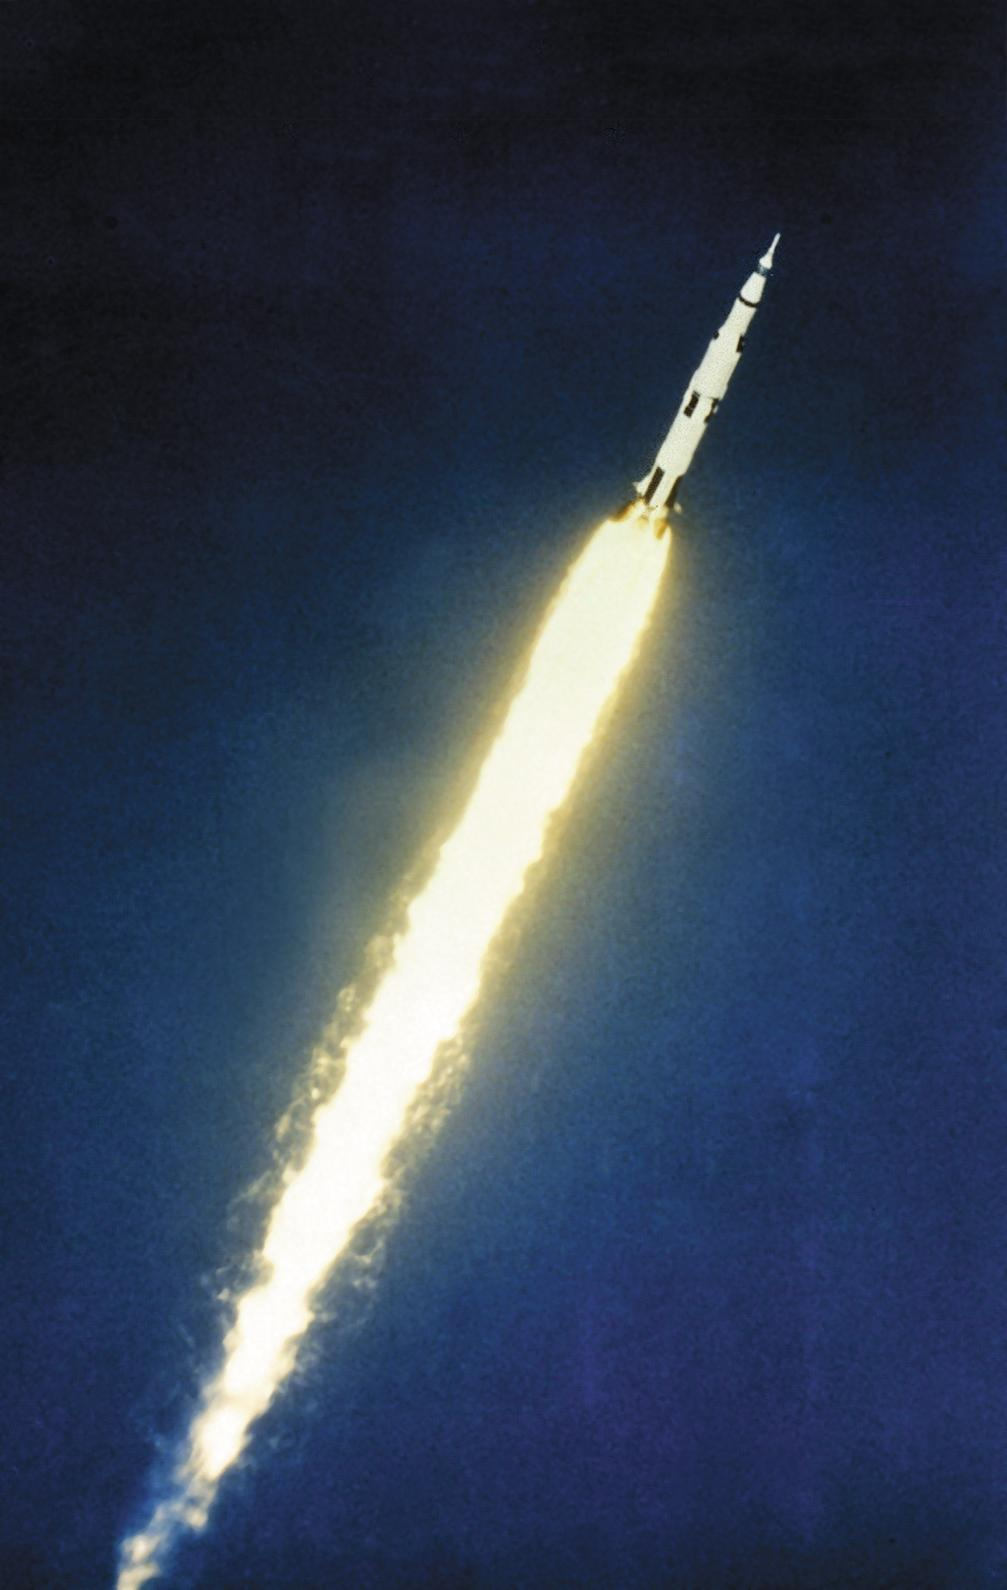 First flight of the Saturn V